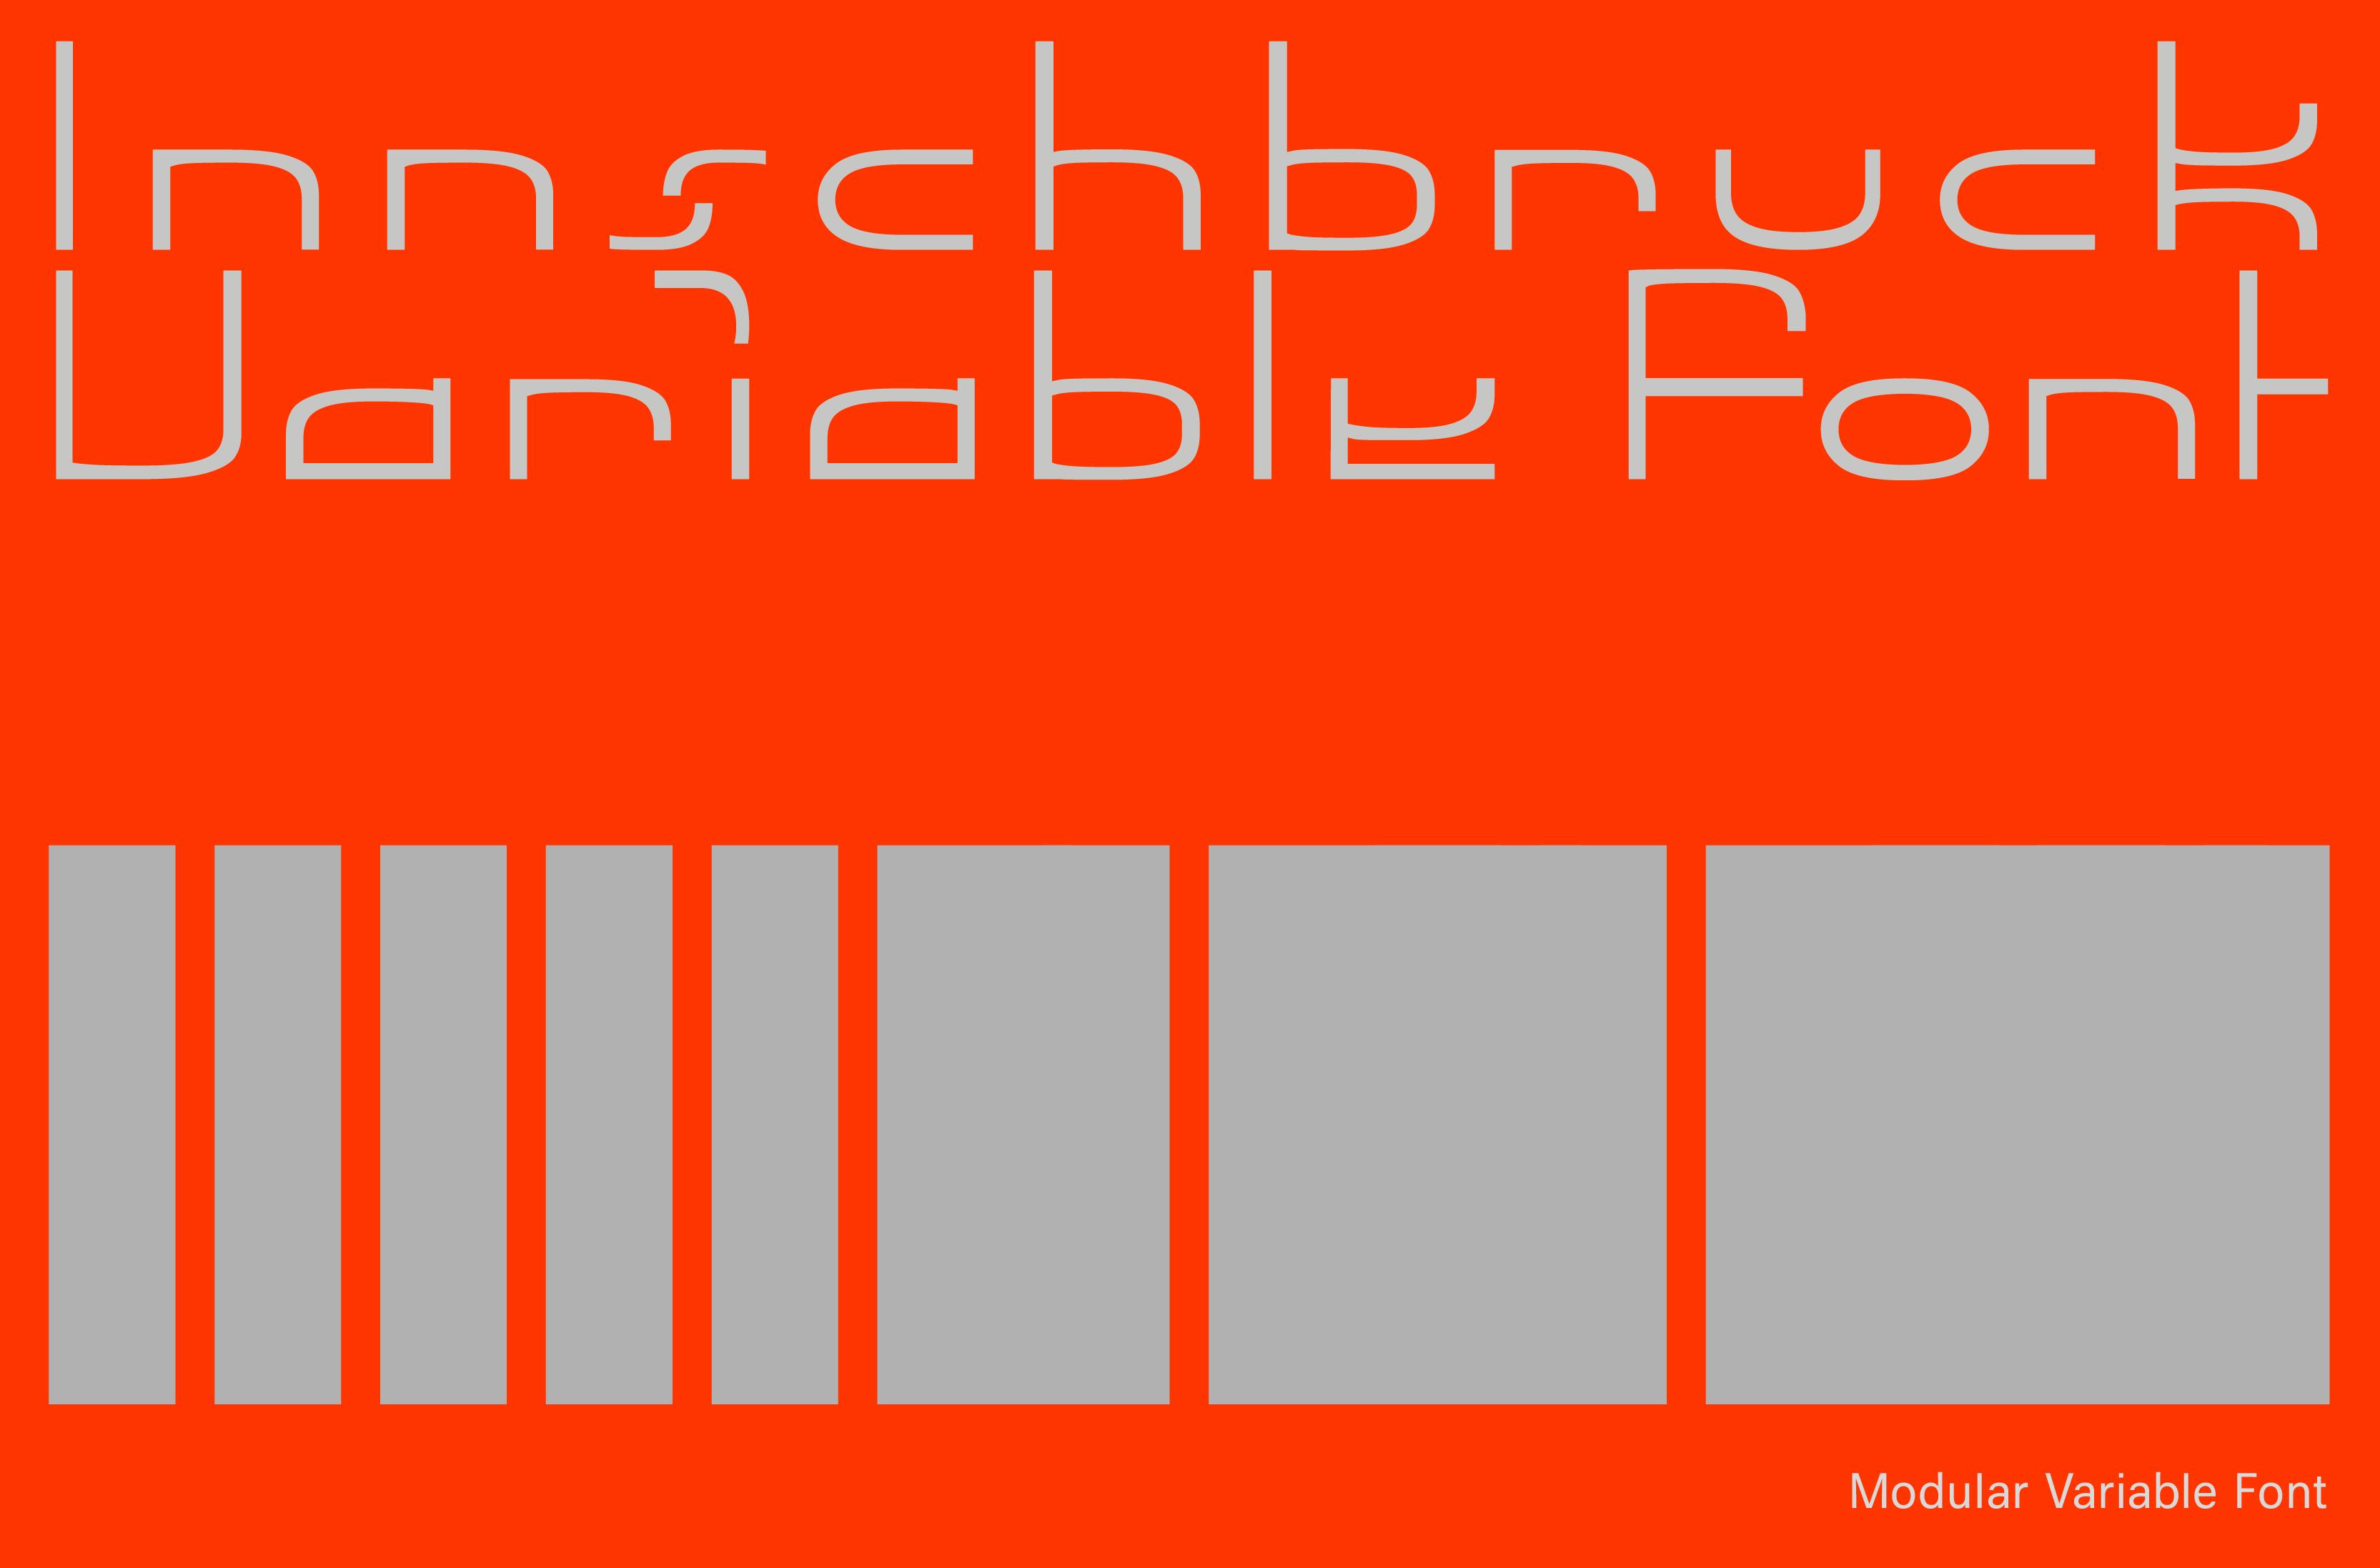 Innschbruck Variable Font Header